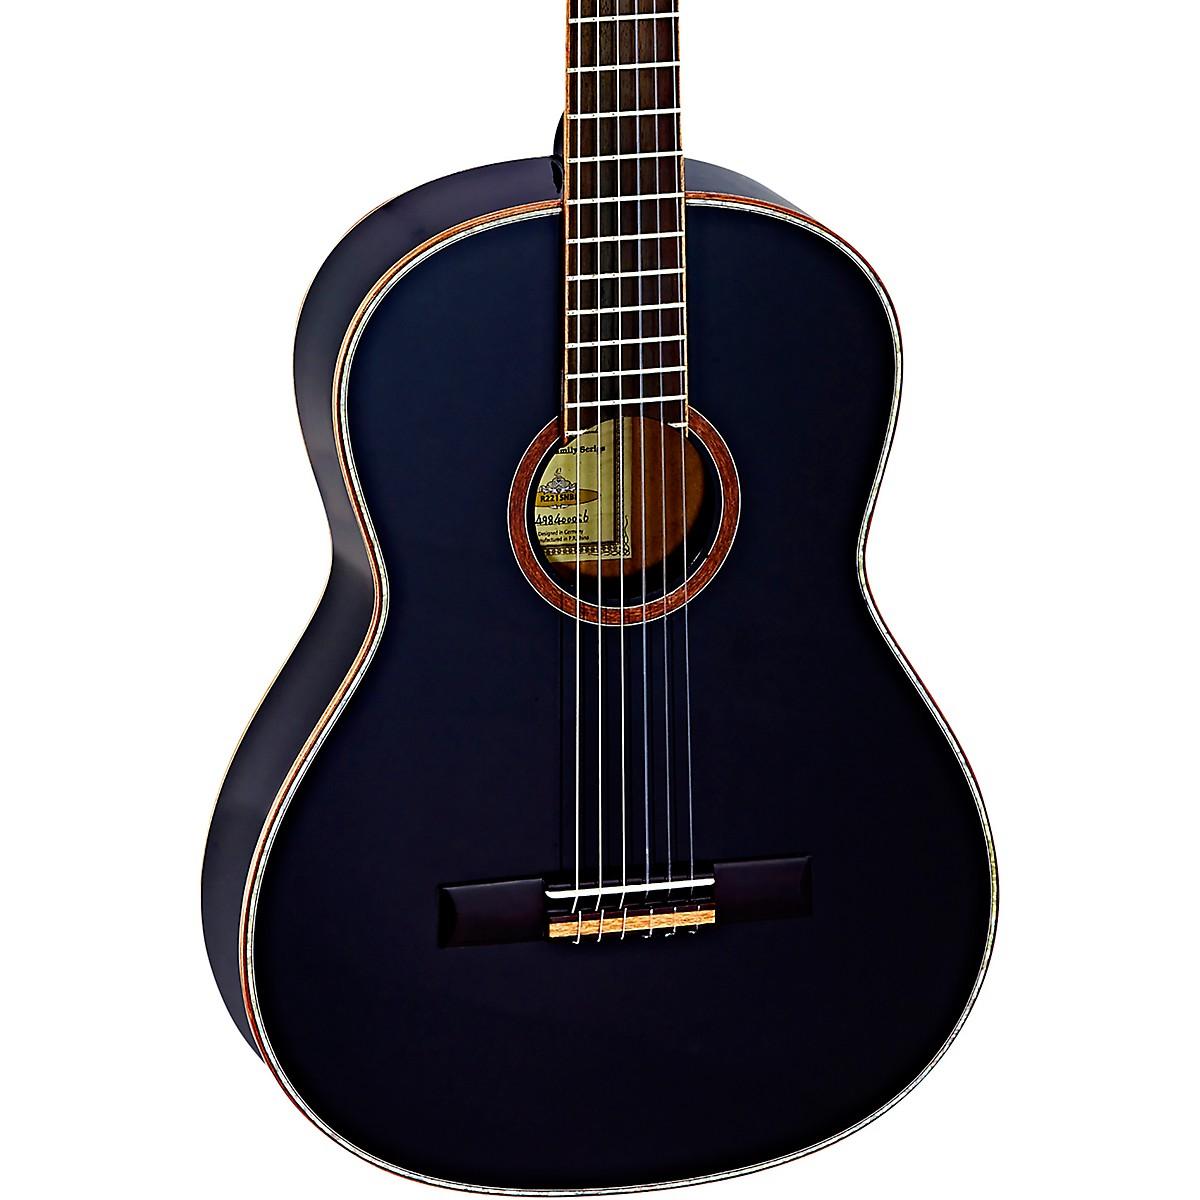 Ortega Family Series R221SNBK Slim Neck Classical Guitar